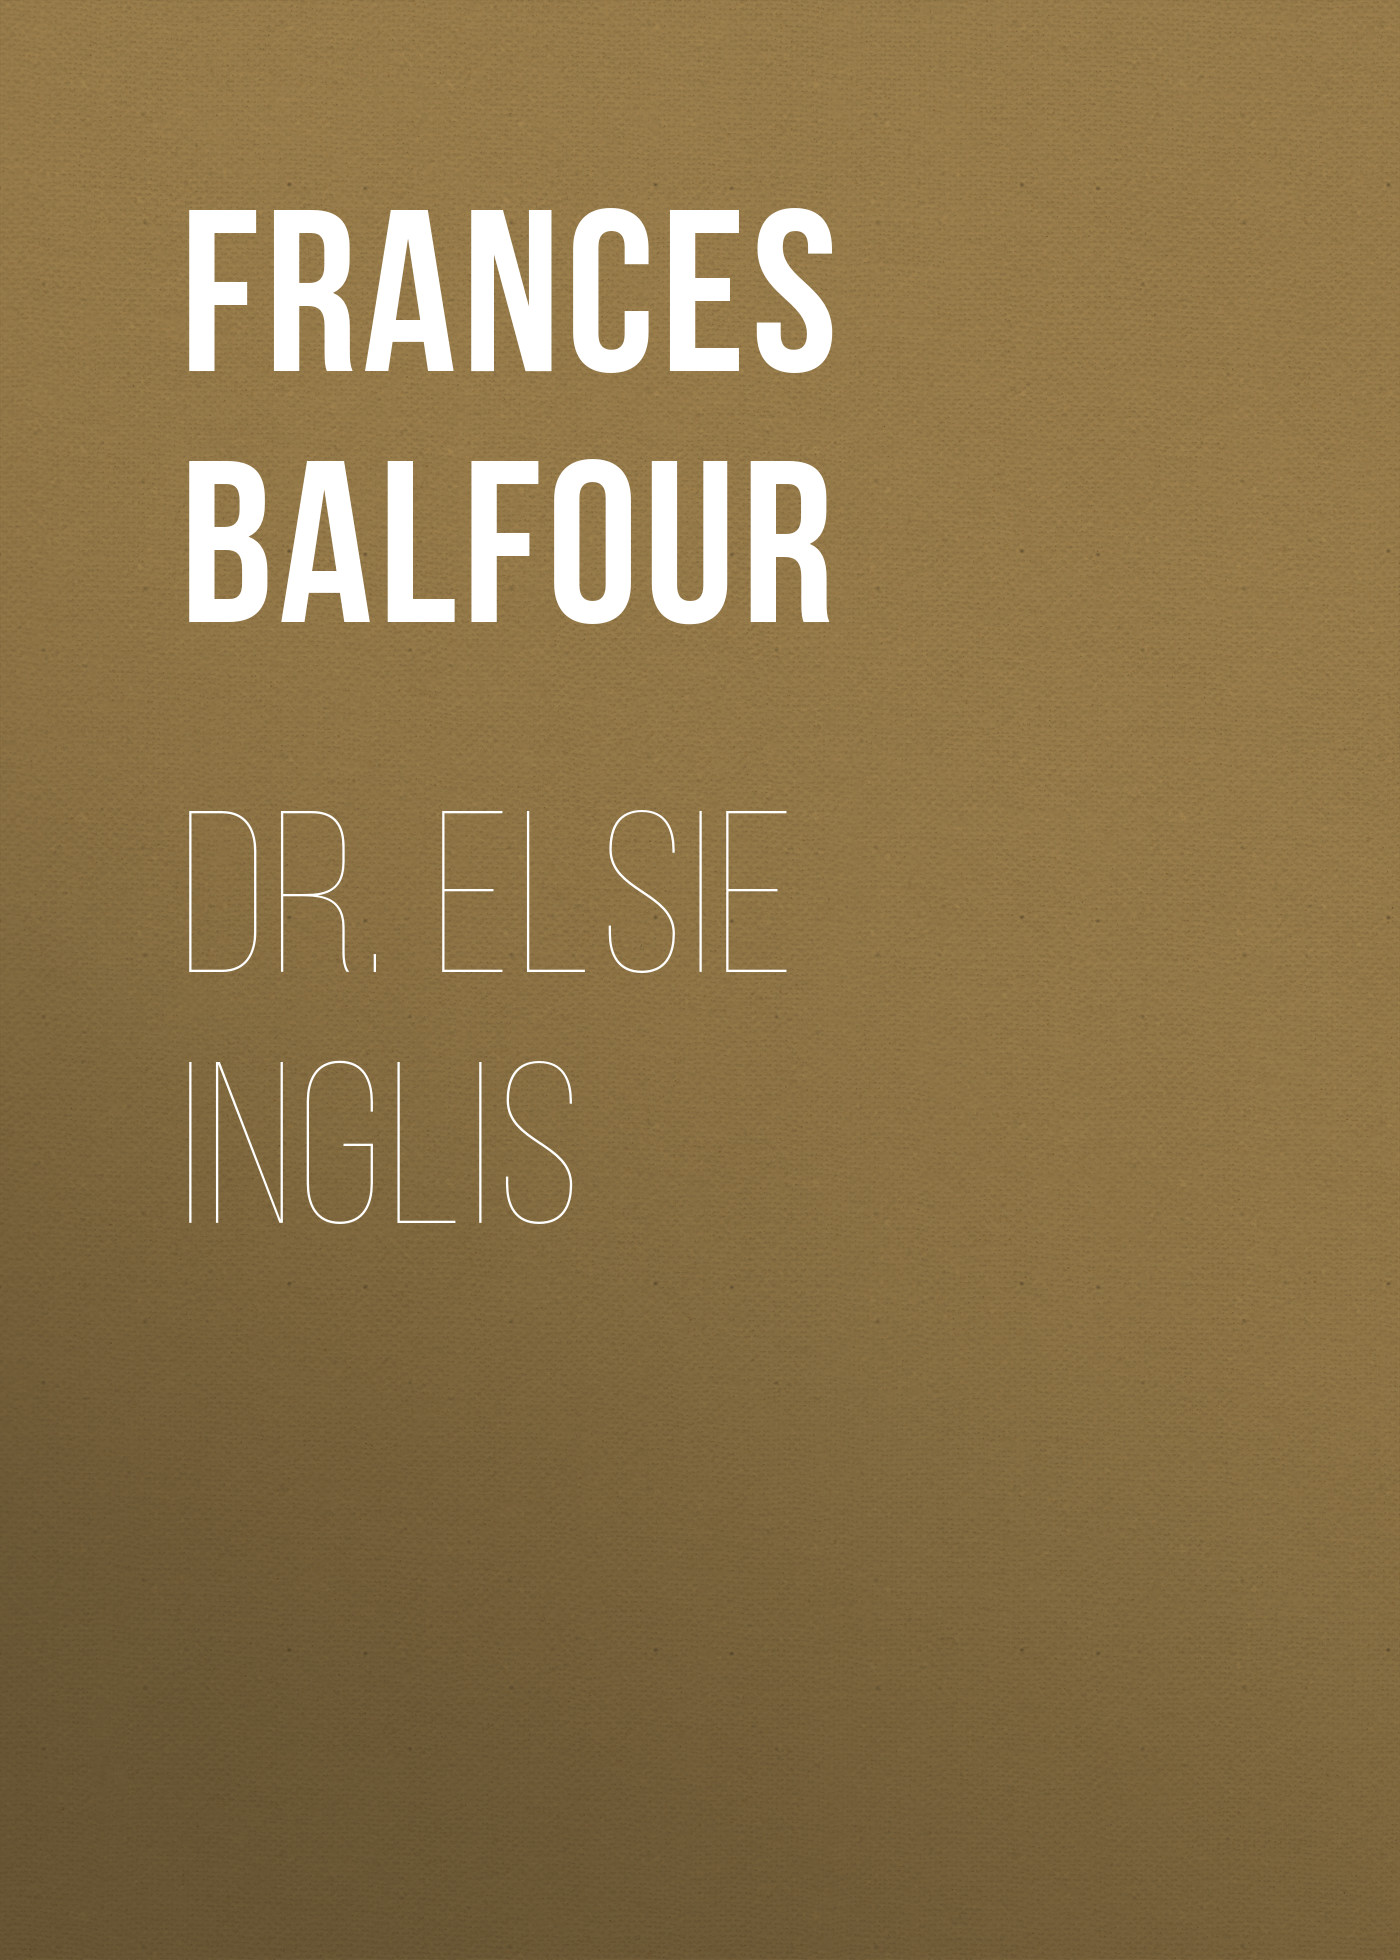 Lady Frances Balfour Dr. Elsie Inglis lady frances balfour dr elsie inglis